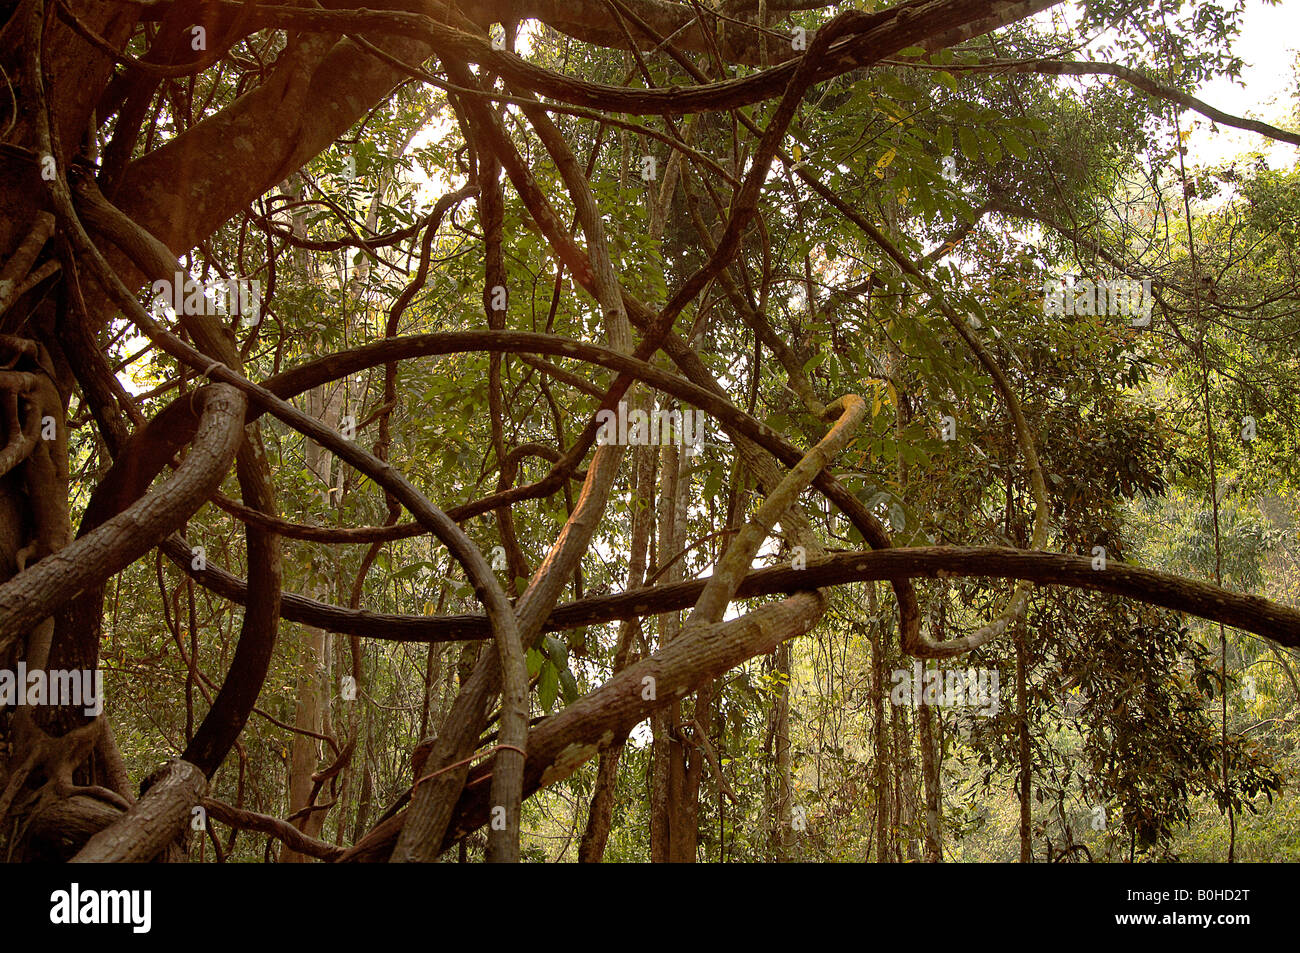 Lianas or woody climbers in tropical rain forest Xishuangbanna Yunnan China - Stock Image